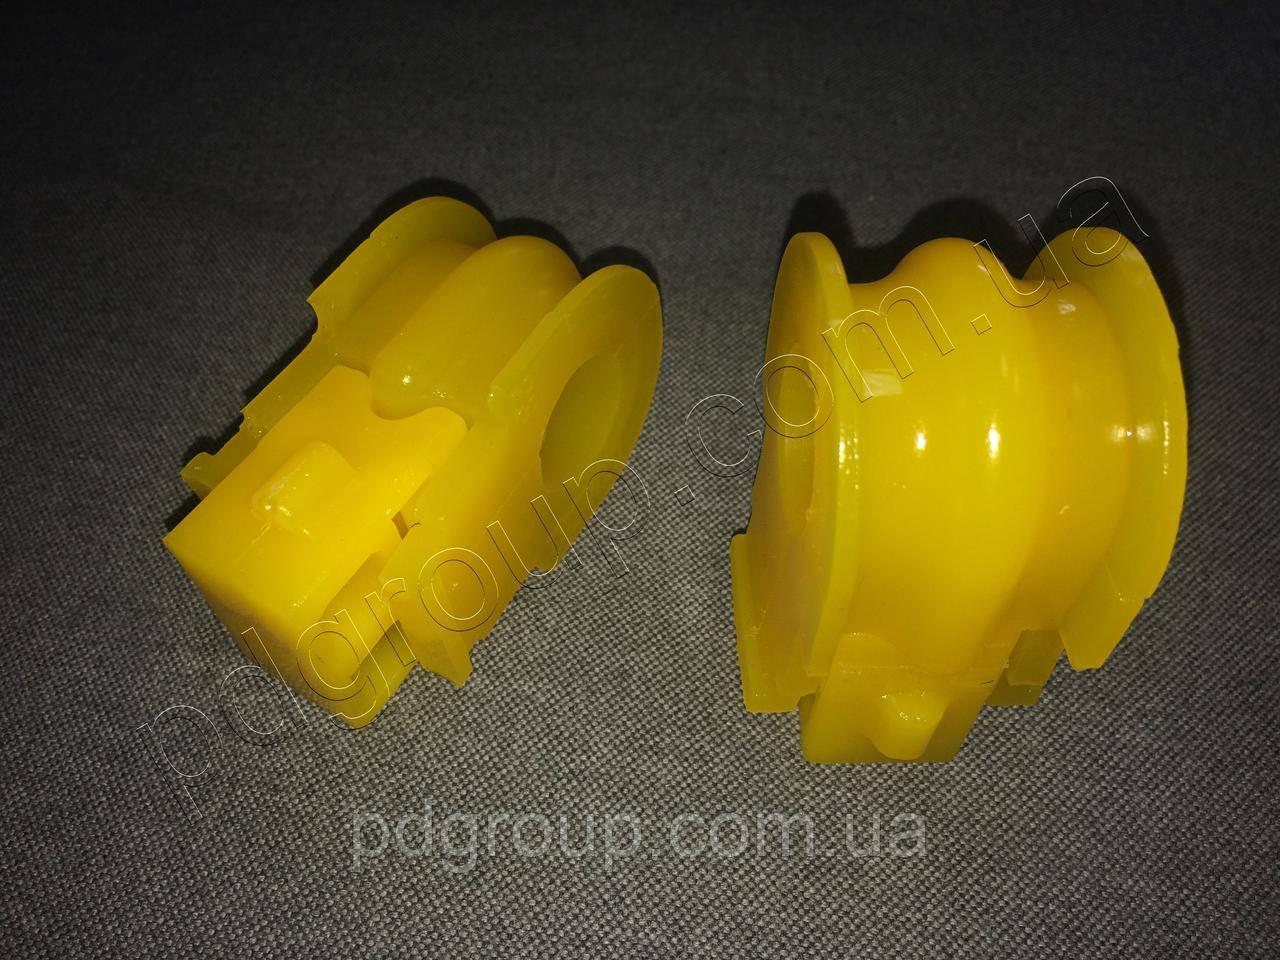 Втулка стабилизатора переднего d=23мм Renault Koleos, Nissan Qashqai, Juke,X-Trail 3 (OEM 54613-JG03A)